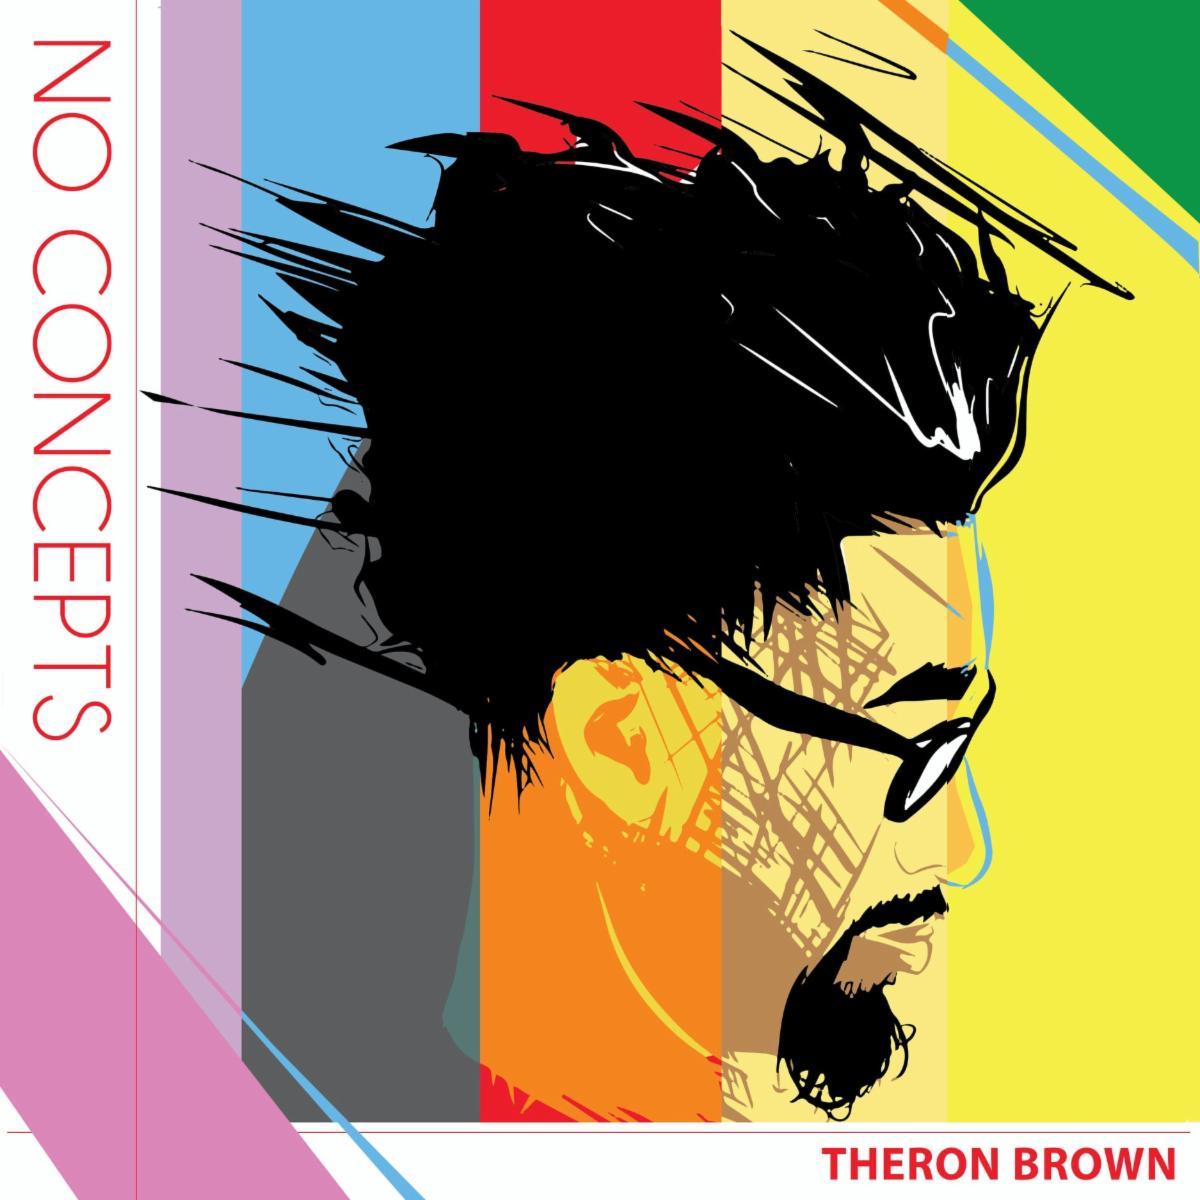 Theron Brown